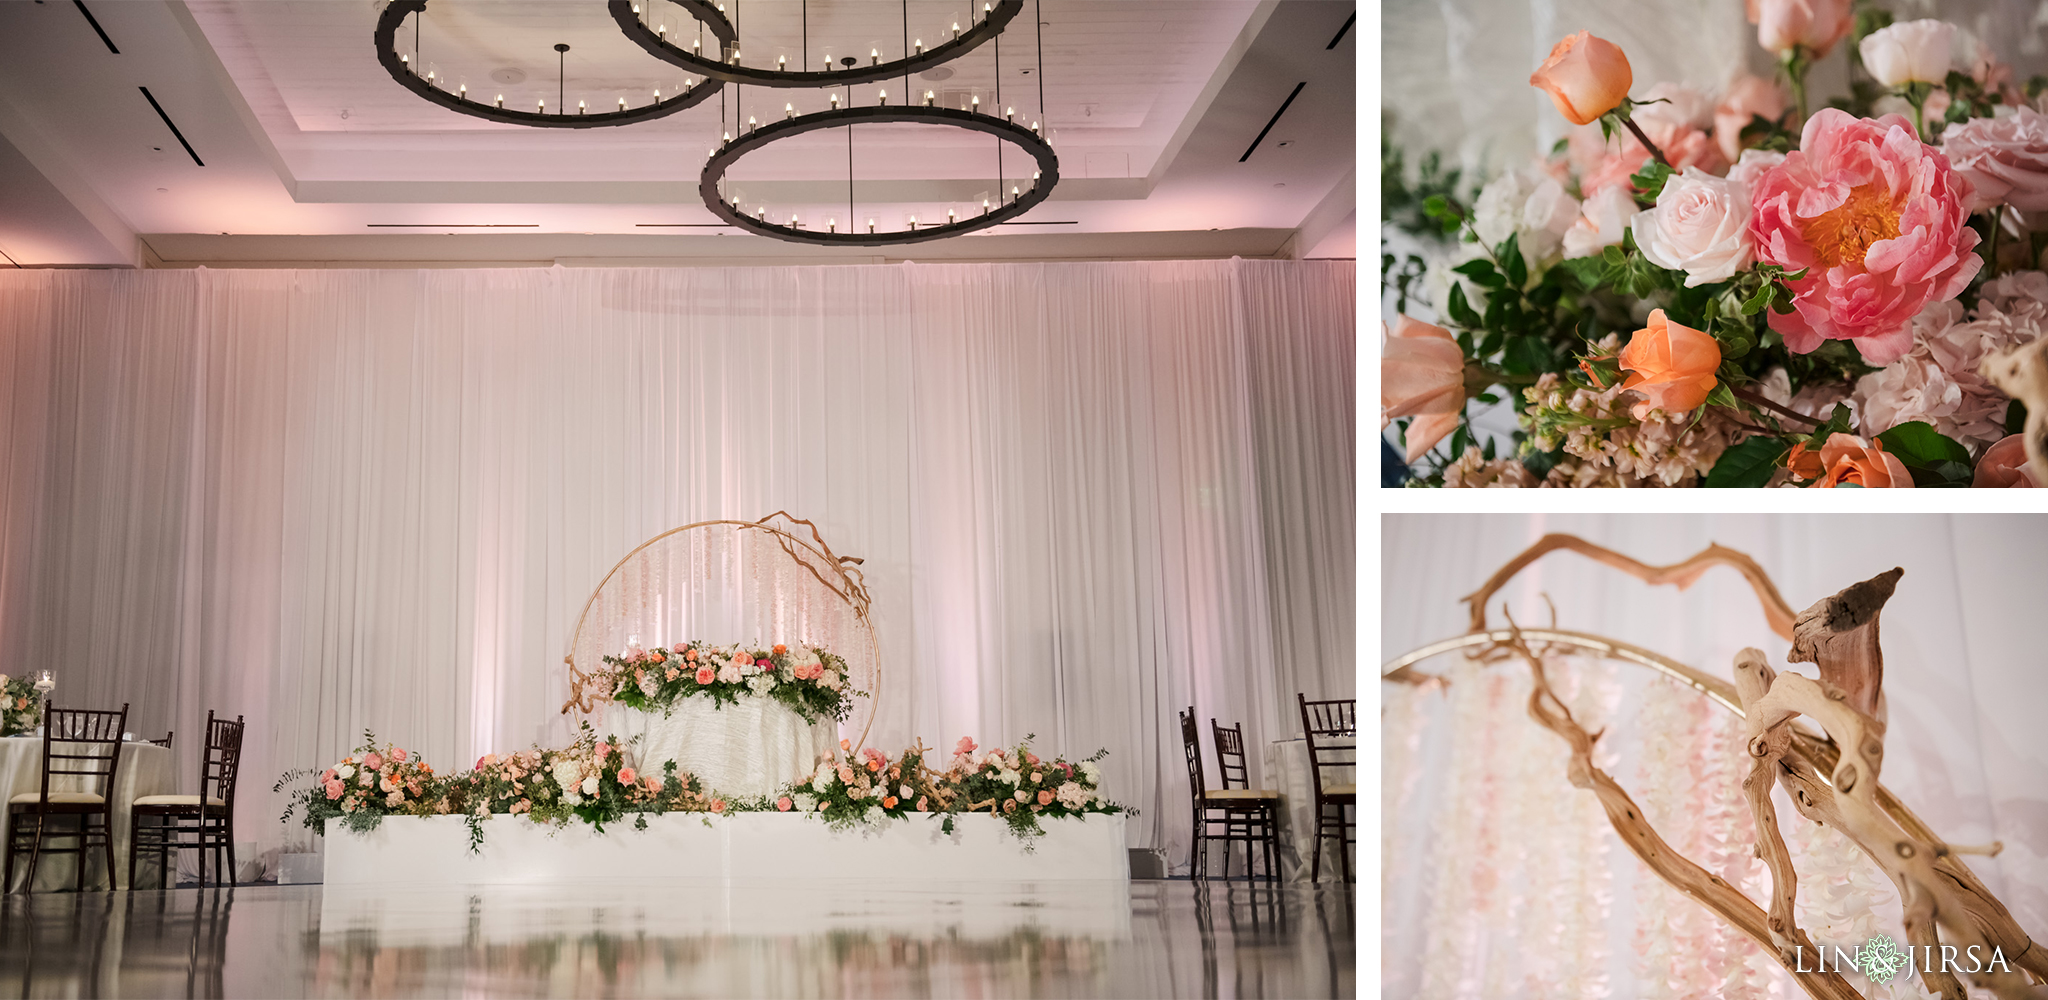 28 The Waterfront Beach Resort Orange County Indian Wedding Photography